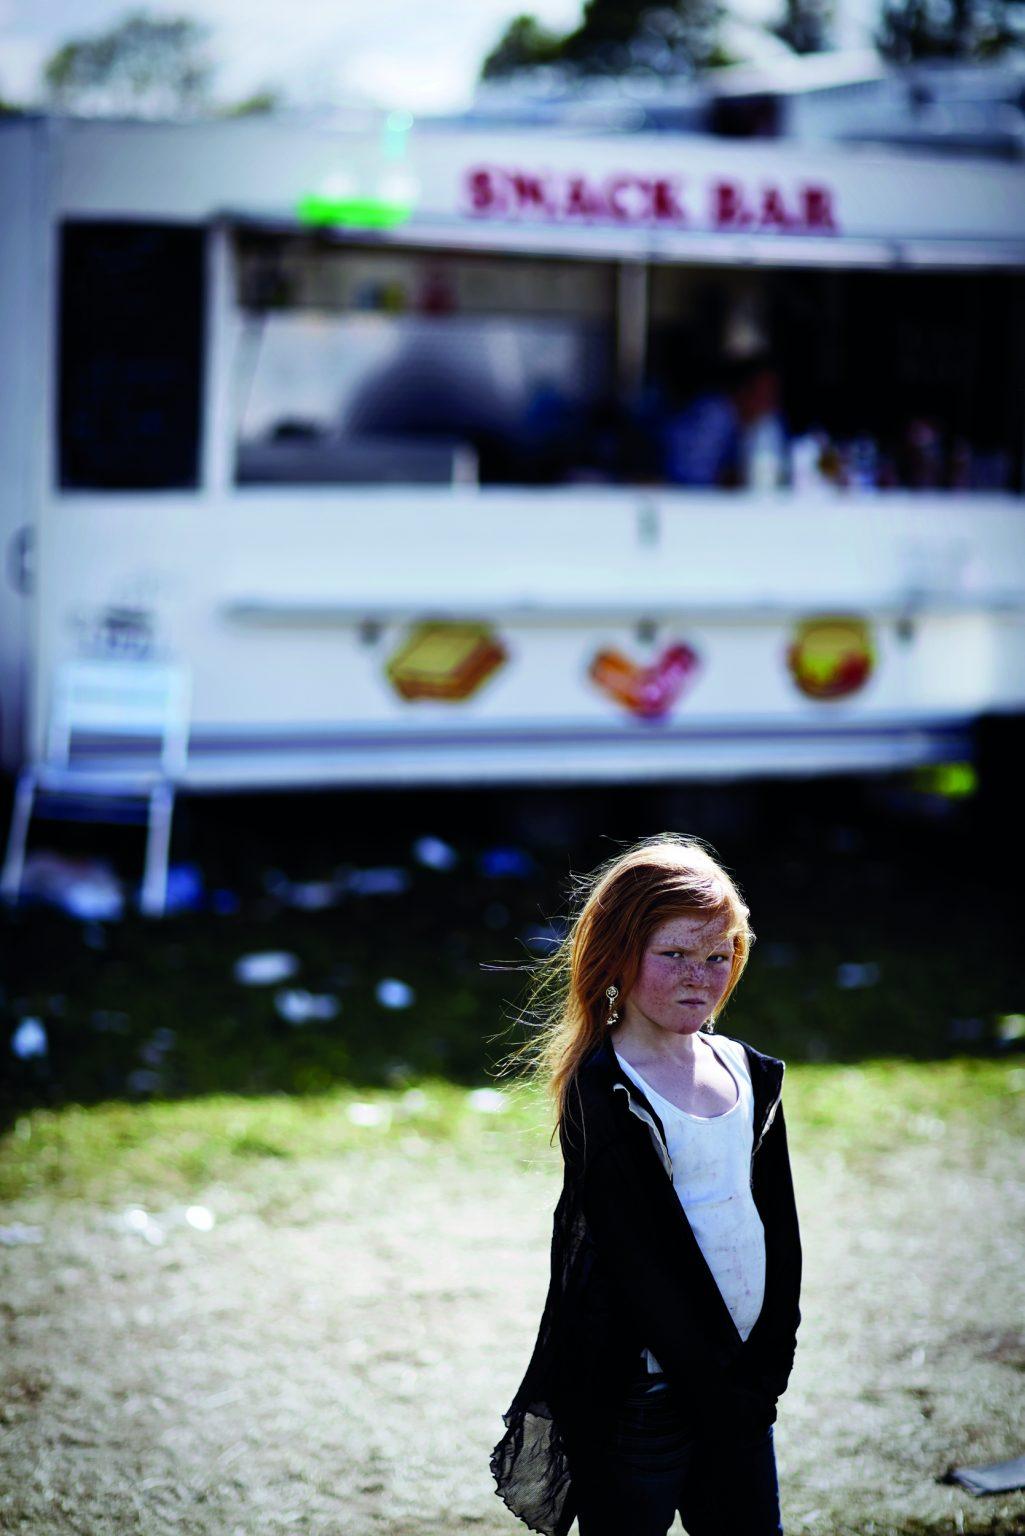 Appleby, United Kingdom, June 2015 - Appleby Horse Fair. Rose standing in front of her mum's hamburger stand. ><  Appleby, Regno Unito, giugno 2015 - Appleby Horse Fair. Rose in piedi di fronte al chiosco di sua madre. *** Local Caption ***